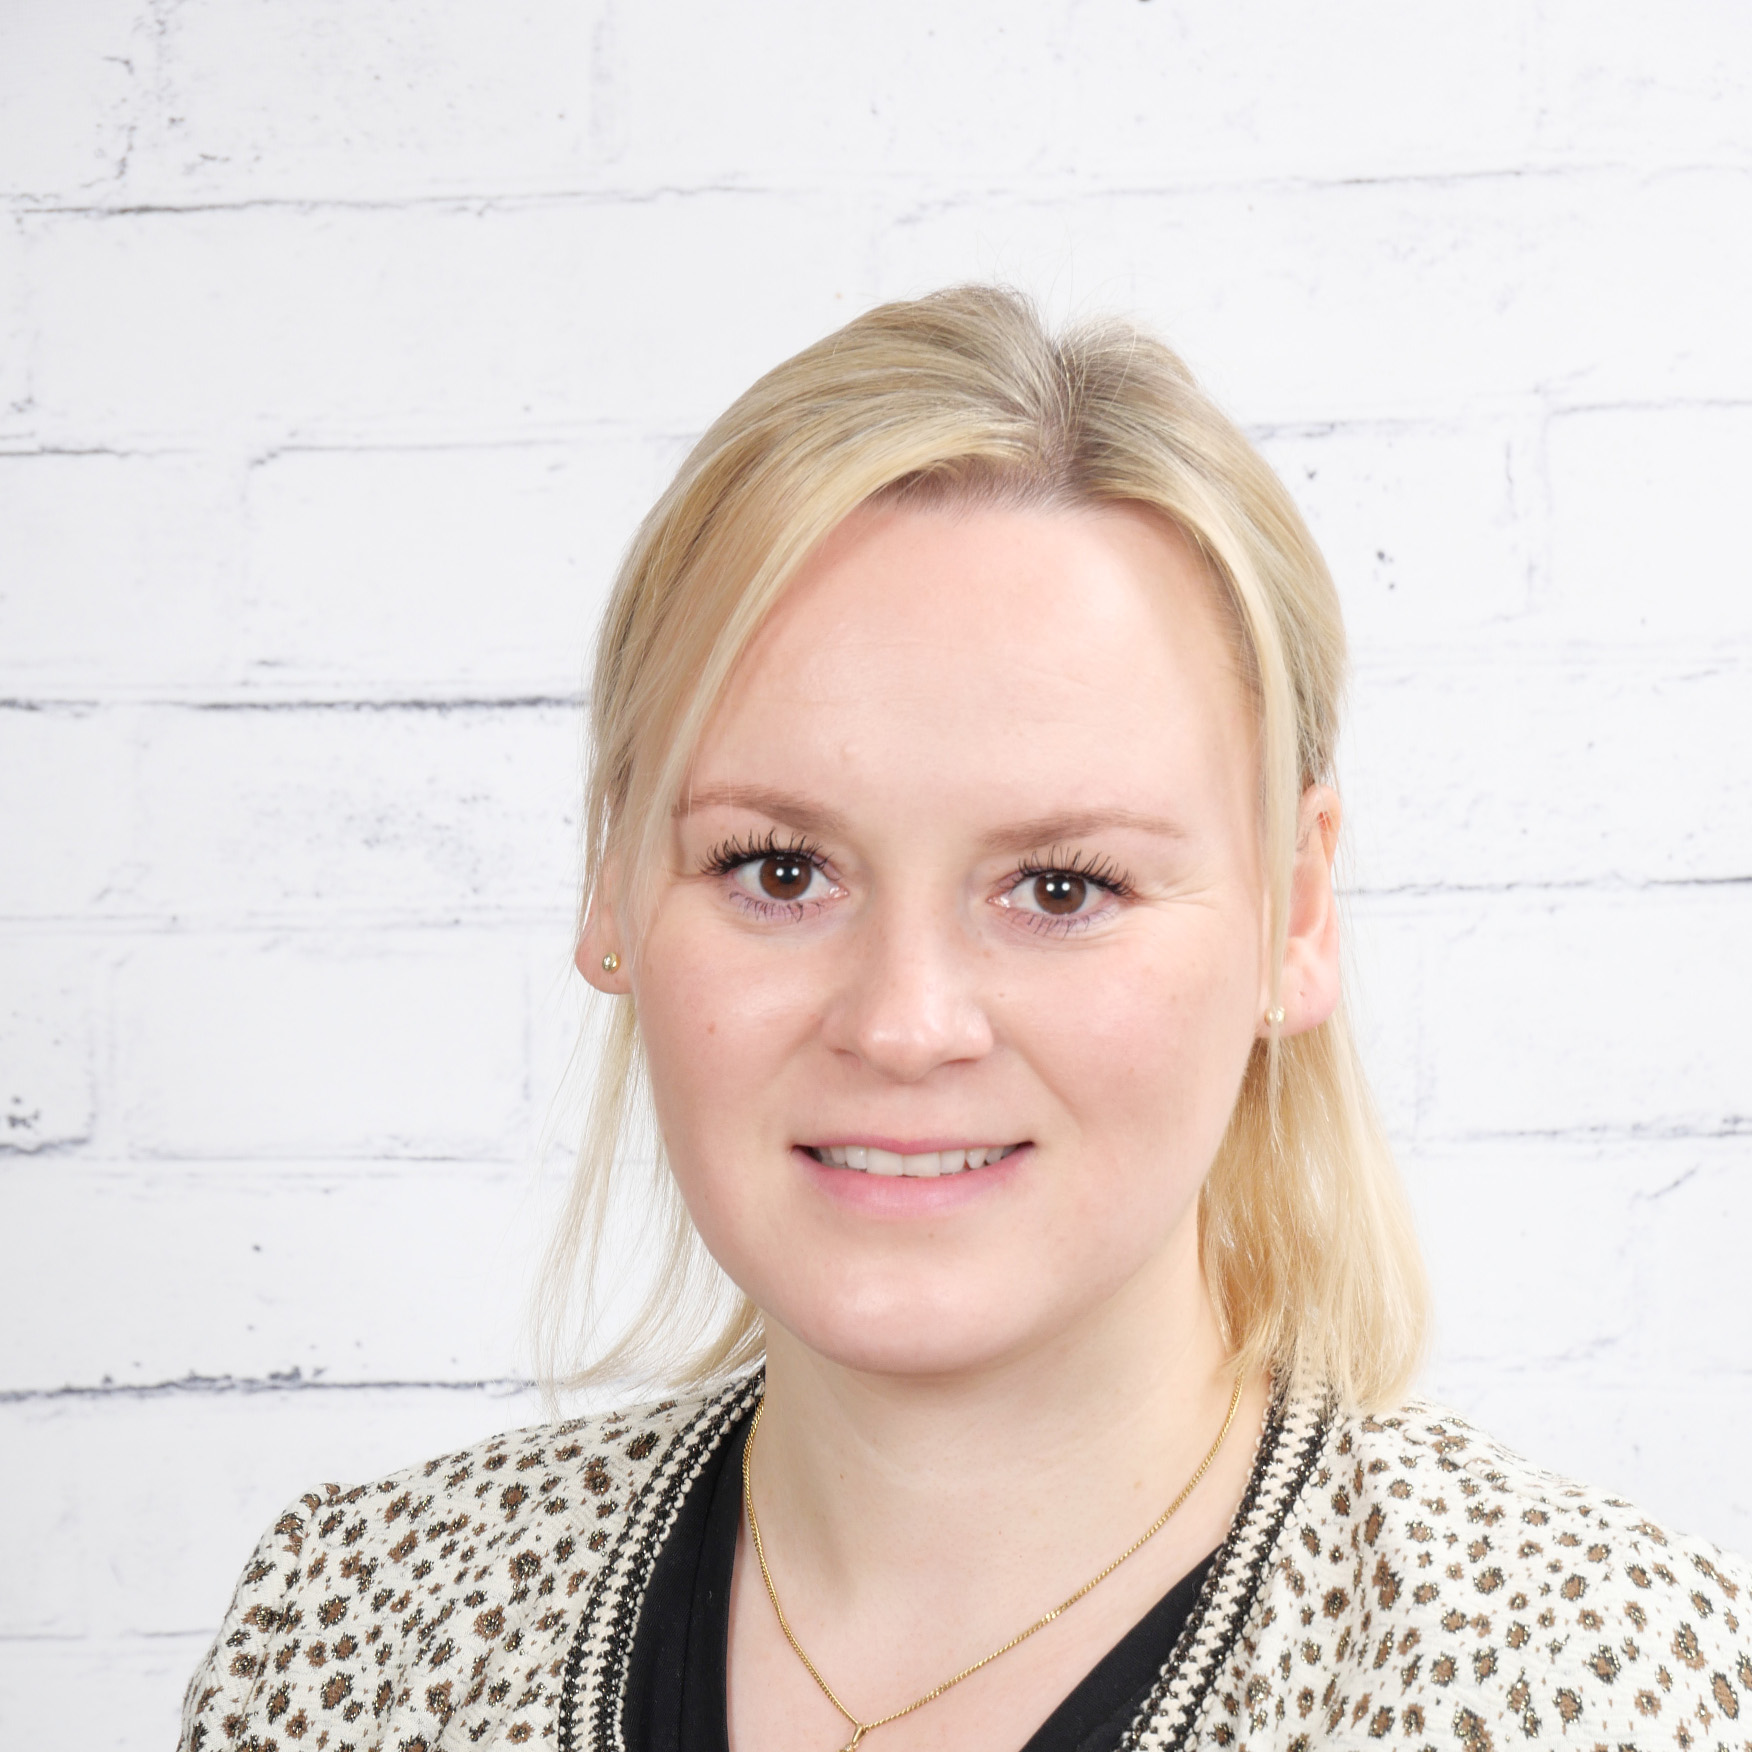 Profilbild von Katharina Klumpe